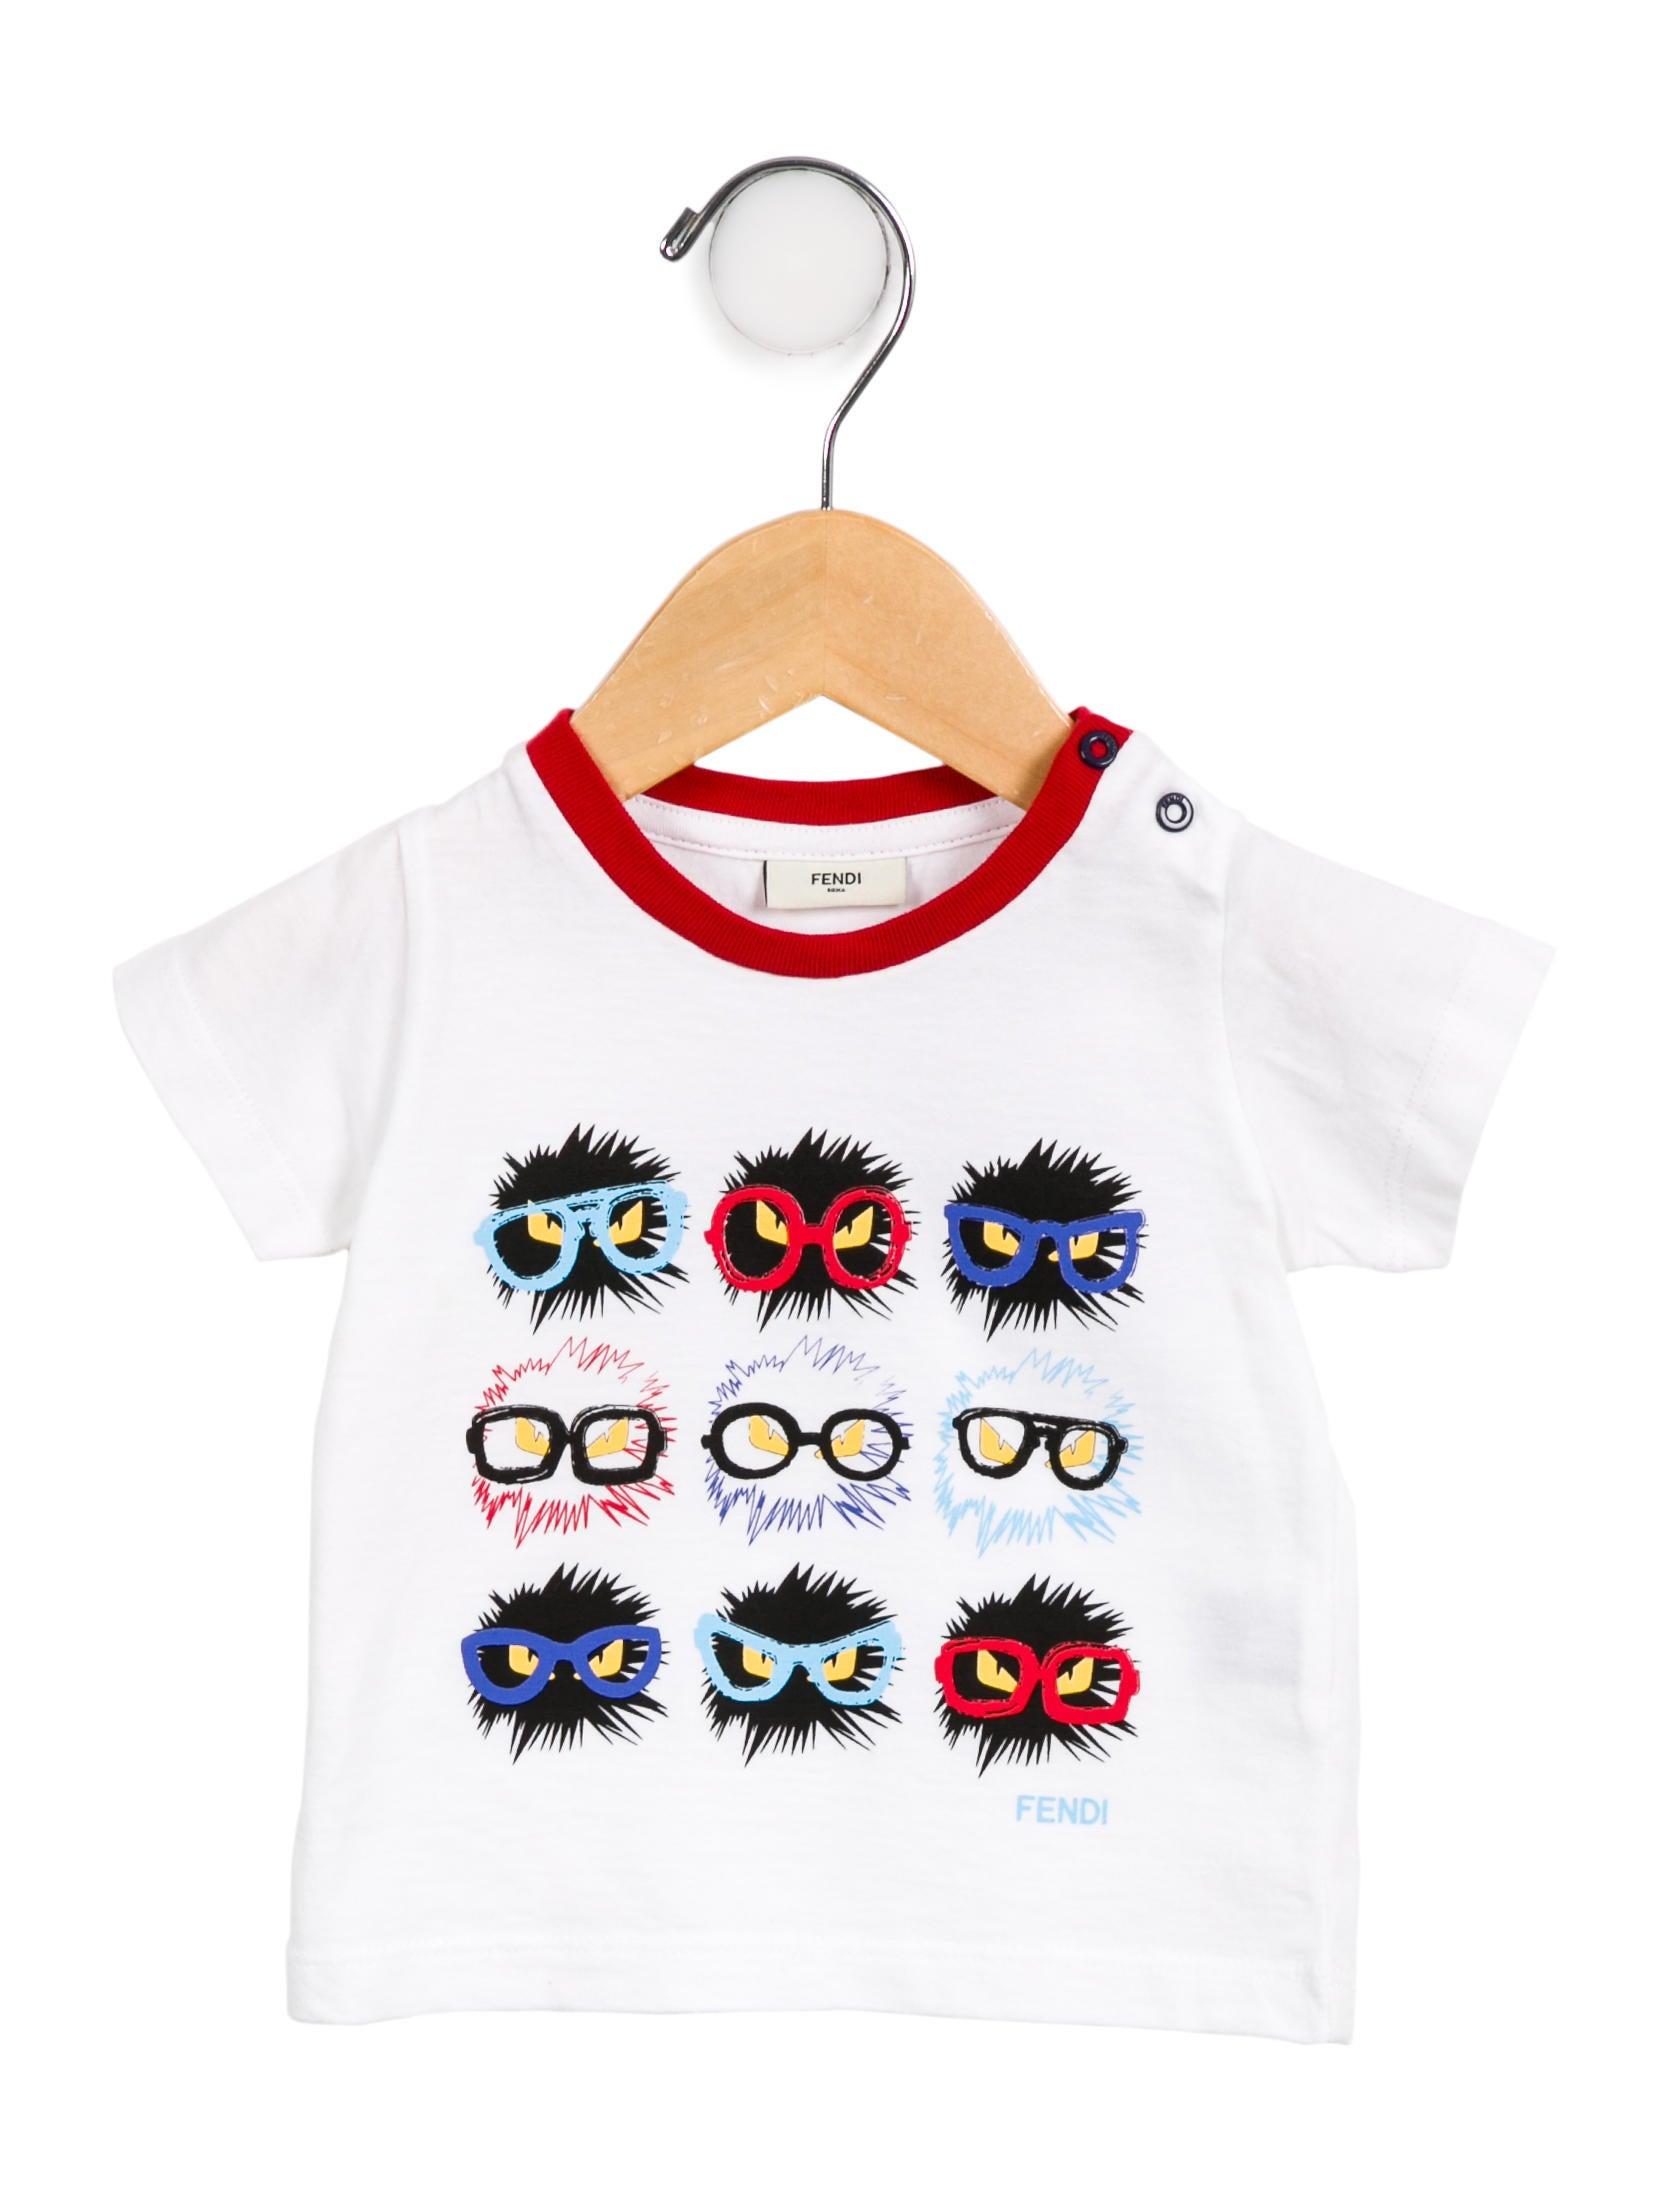 392a44cc678a Fendi Boys  Graphic Monster T-Shirt - Boys - FEN76645